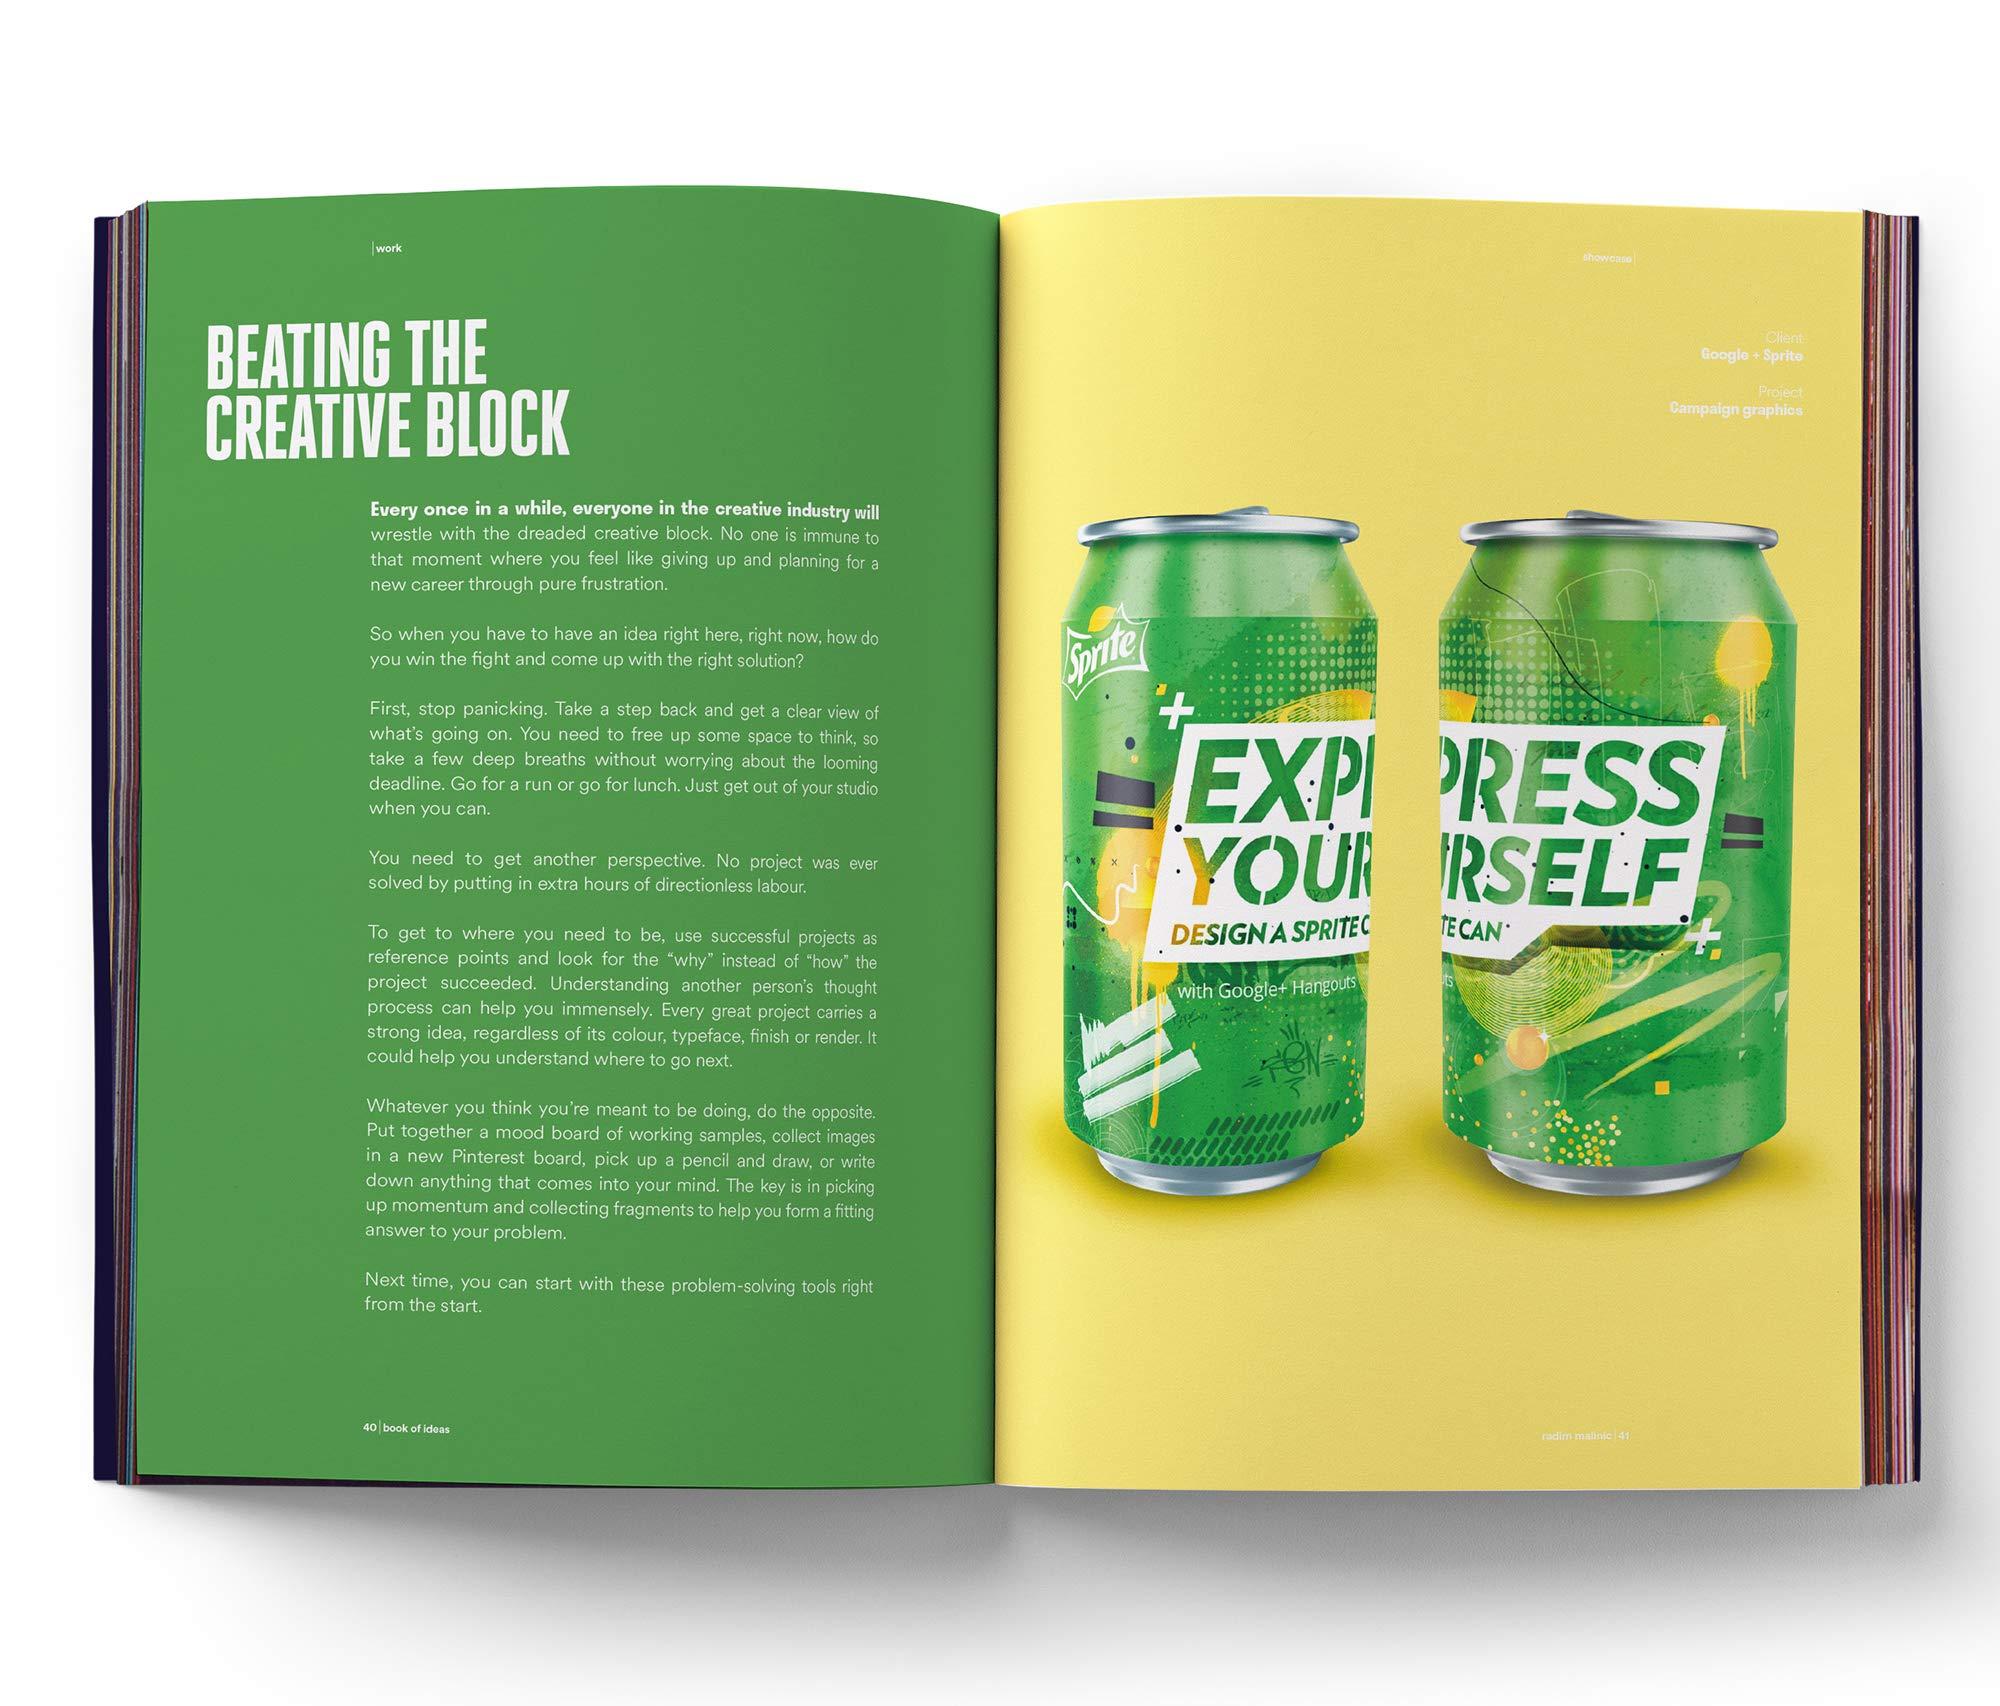 Malinic R Book Of Ideas A Journal Of Creative Direction And Graphic Design Volume 1 Malinic Radim Fremdsprachige Bücher